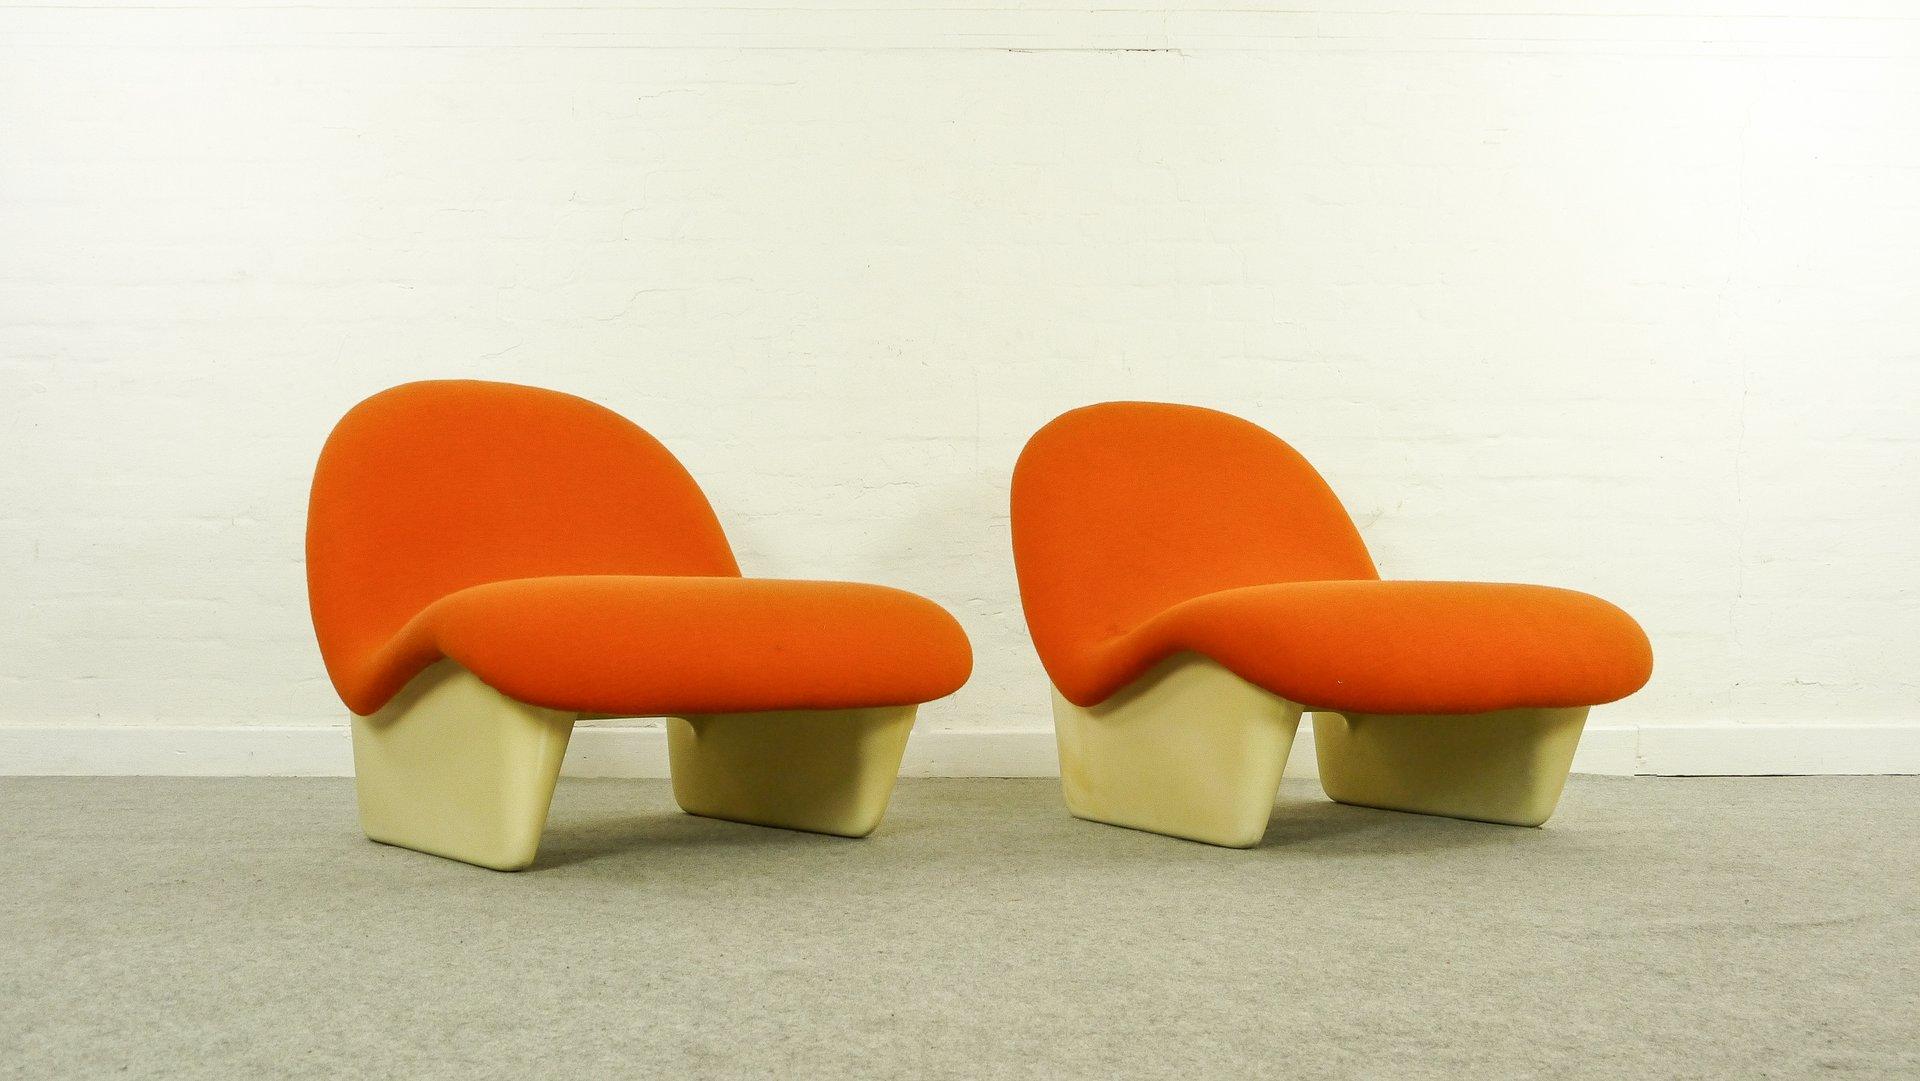 Orange Sadima Sessel von Luigi Colani für Basf, 1970er, 2er Set